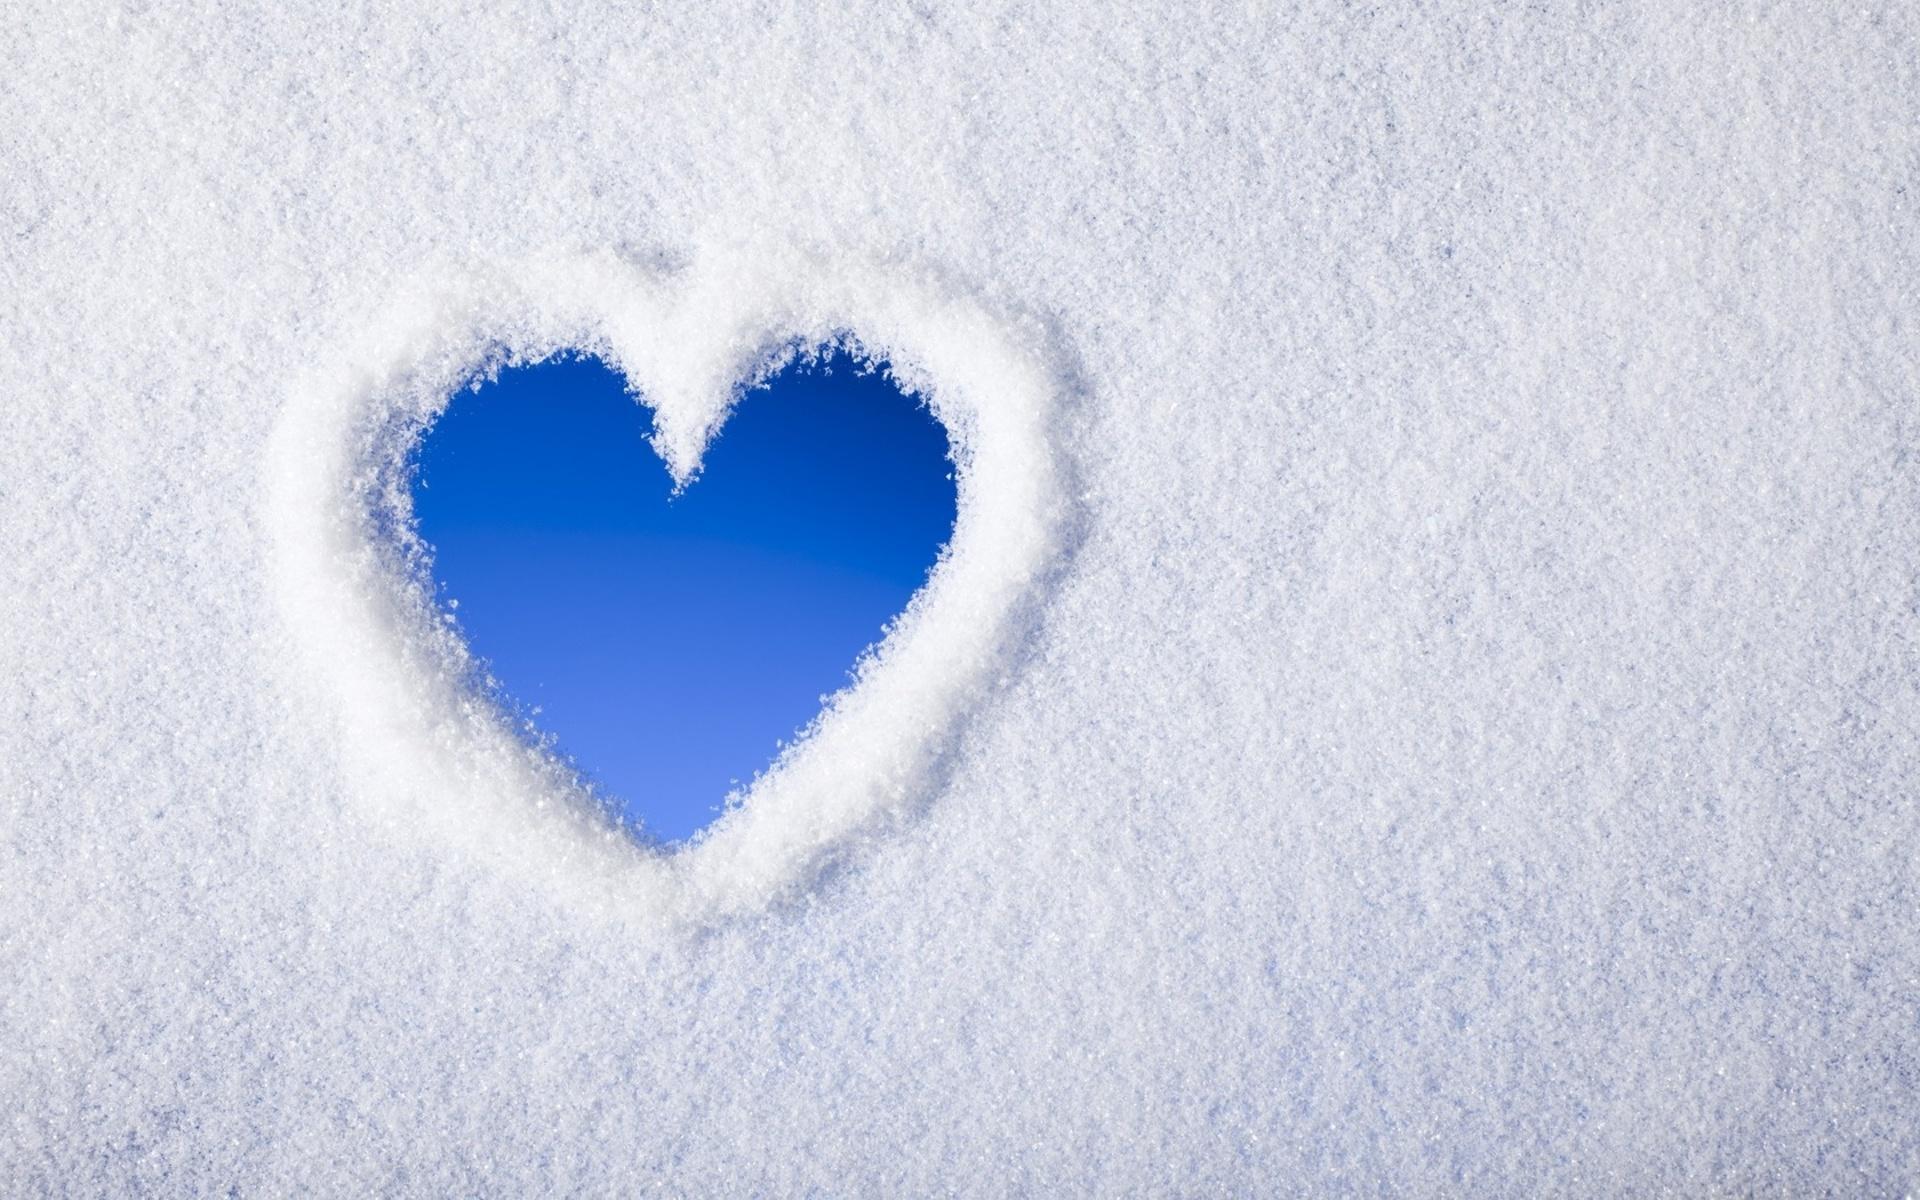 Wallpaper Hd Snow Falling Snow Heart Wallpapers Hd Wallpapers Id 14307